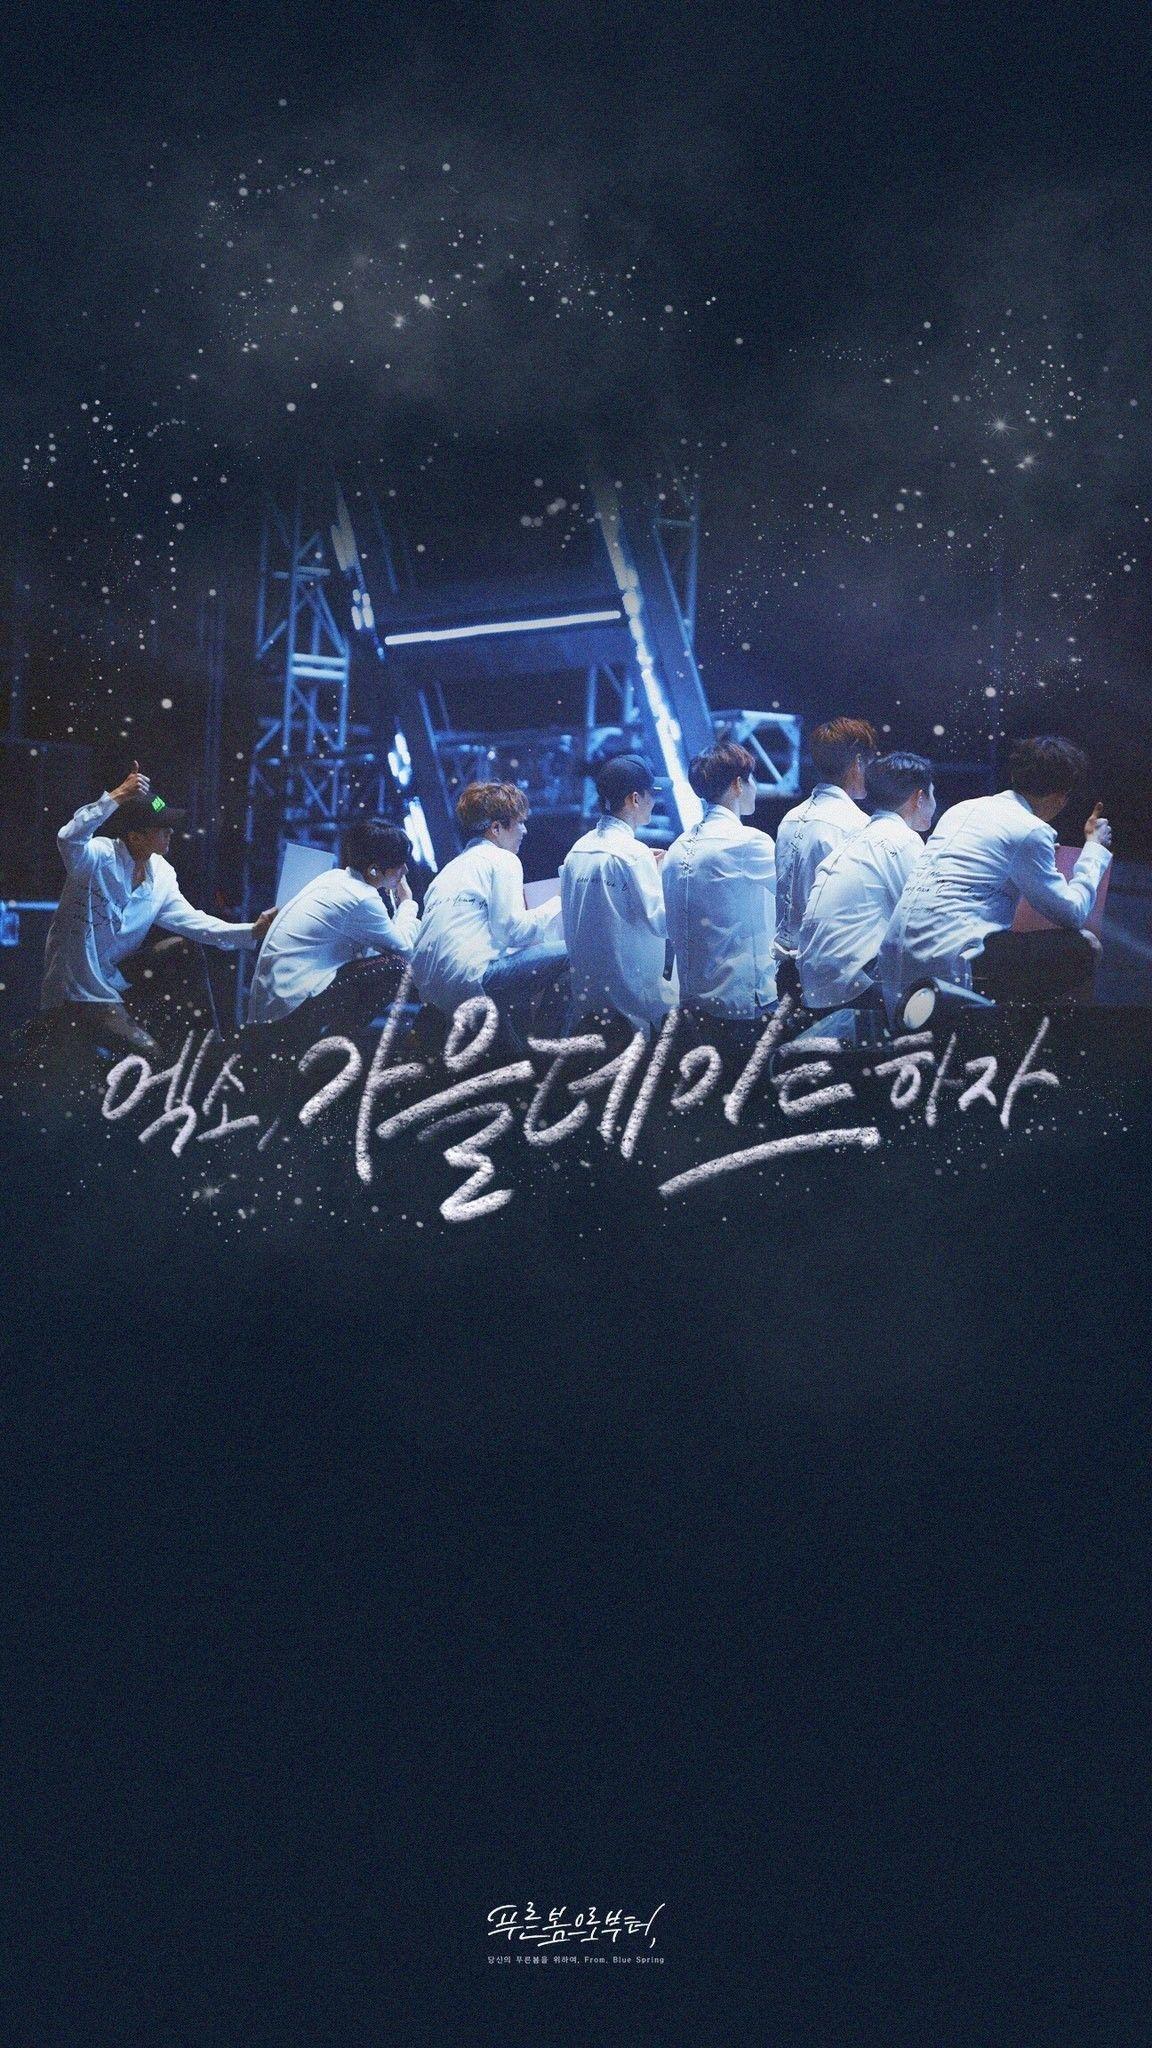 Lock Screen Korean Wallpaper Iphone In 2020 Exo Exo Wallpaper Hd Exo Lockscreen